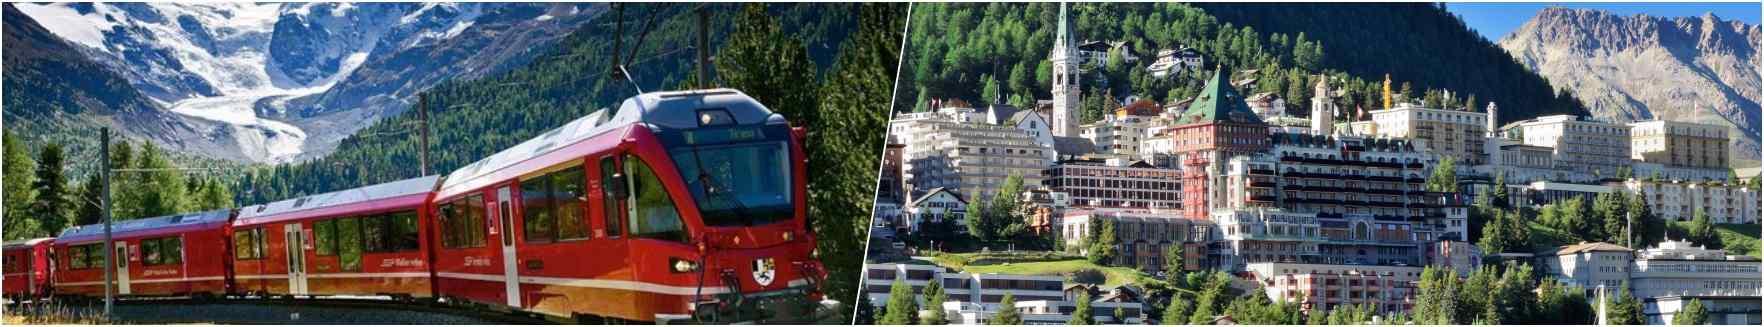 alpine train-st.moritz